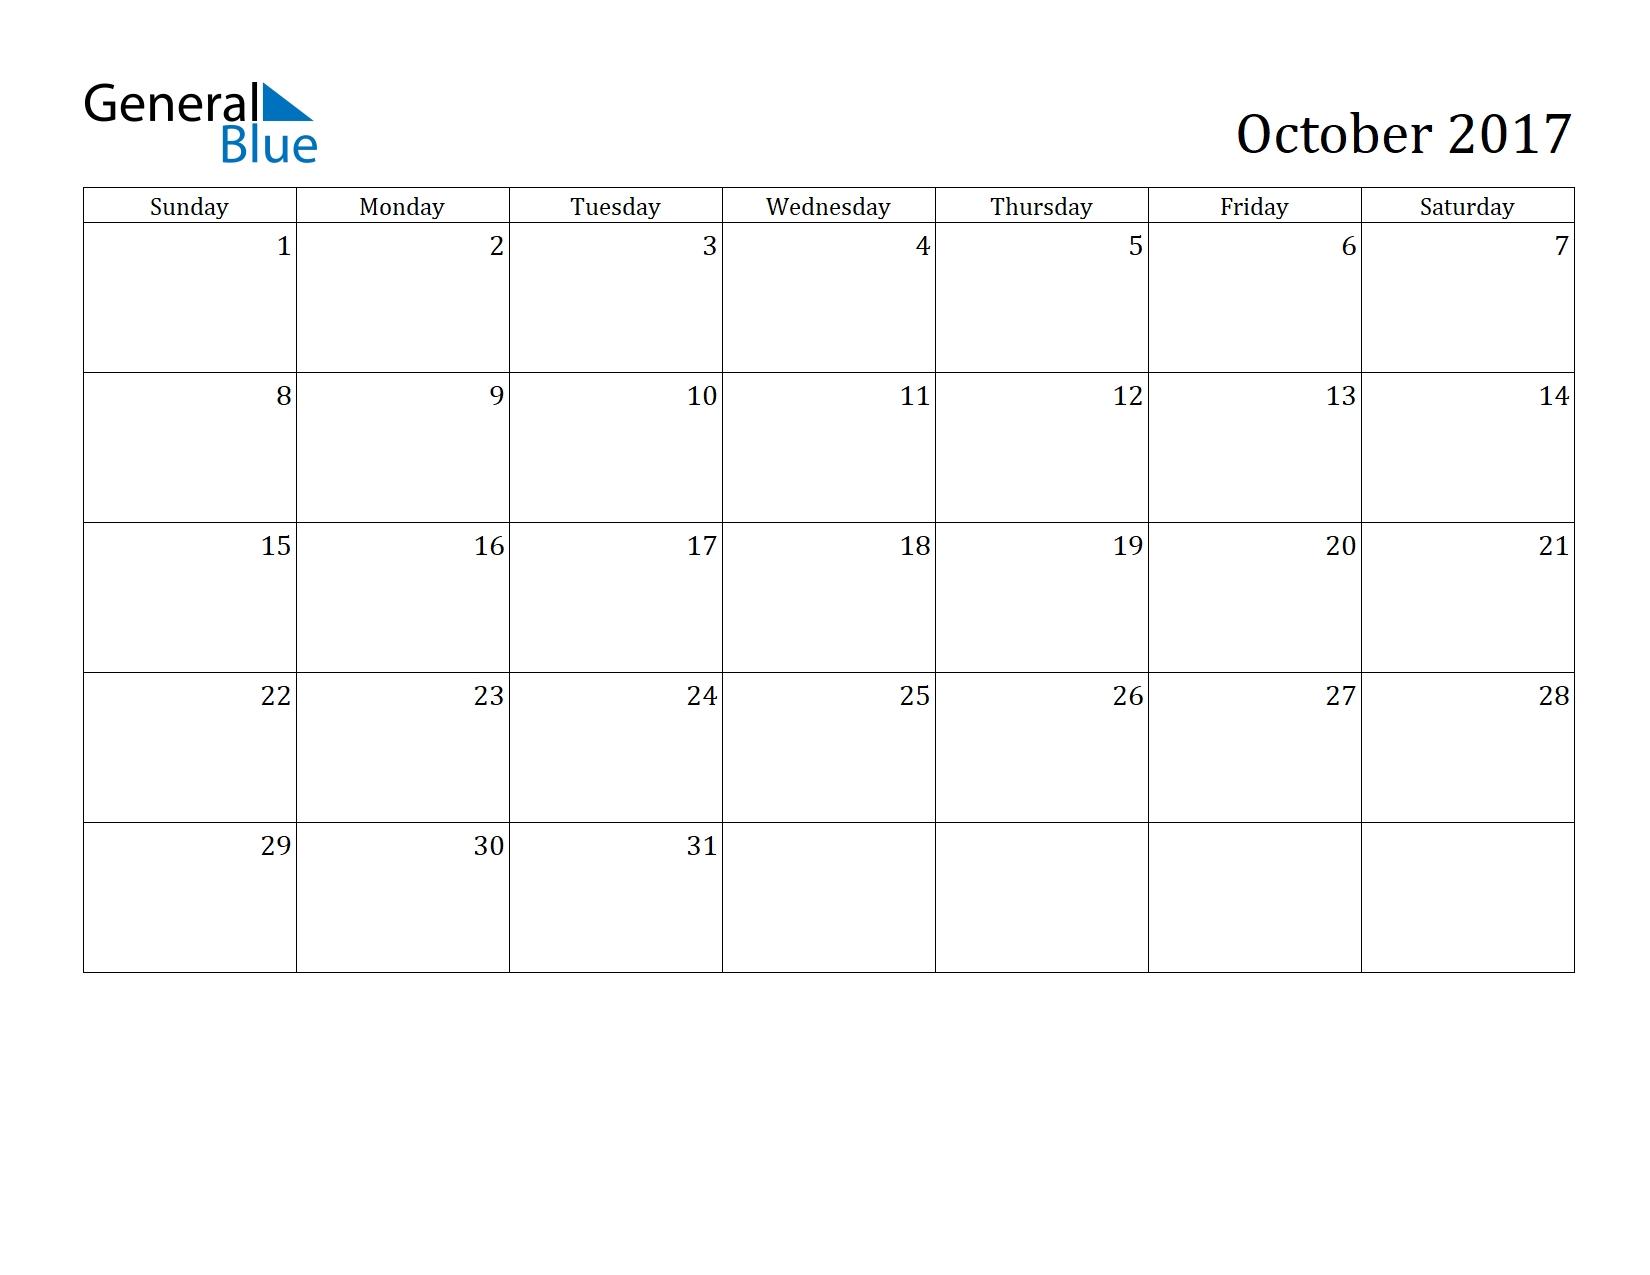 October 2017 Calendar | General Blue General Blue October 2021 Calendar